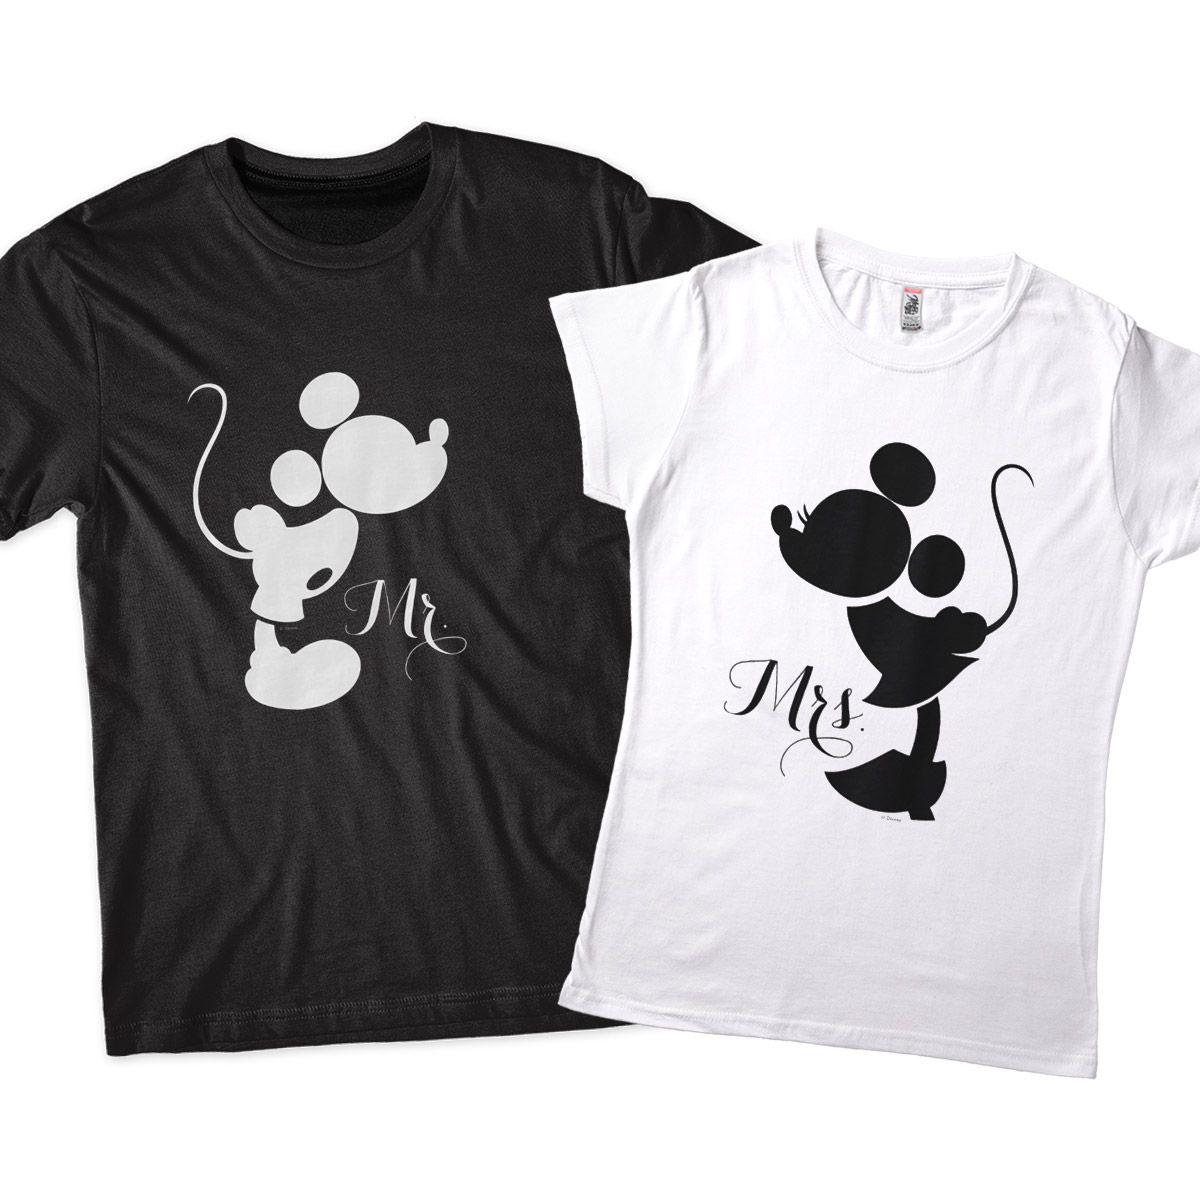 camisa para encontro de casal kit camisetas